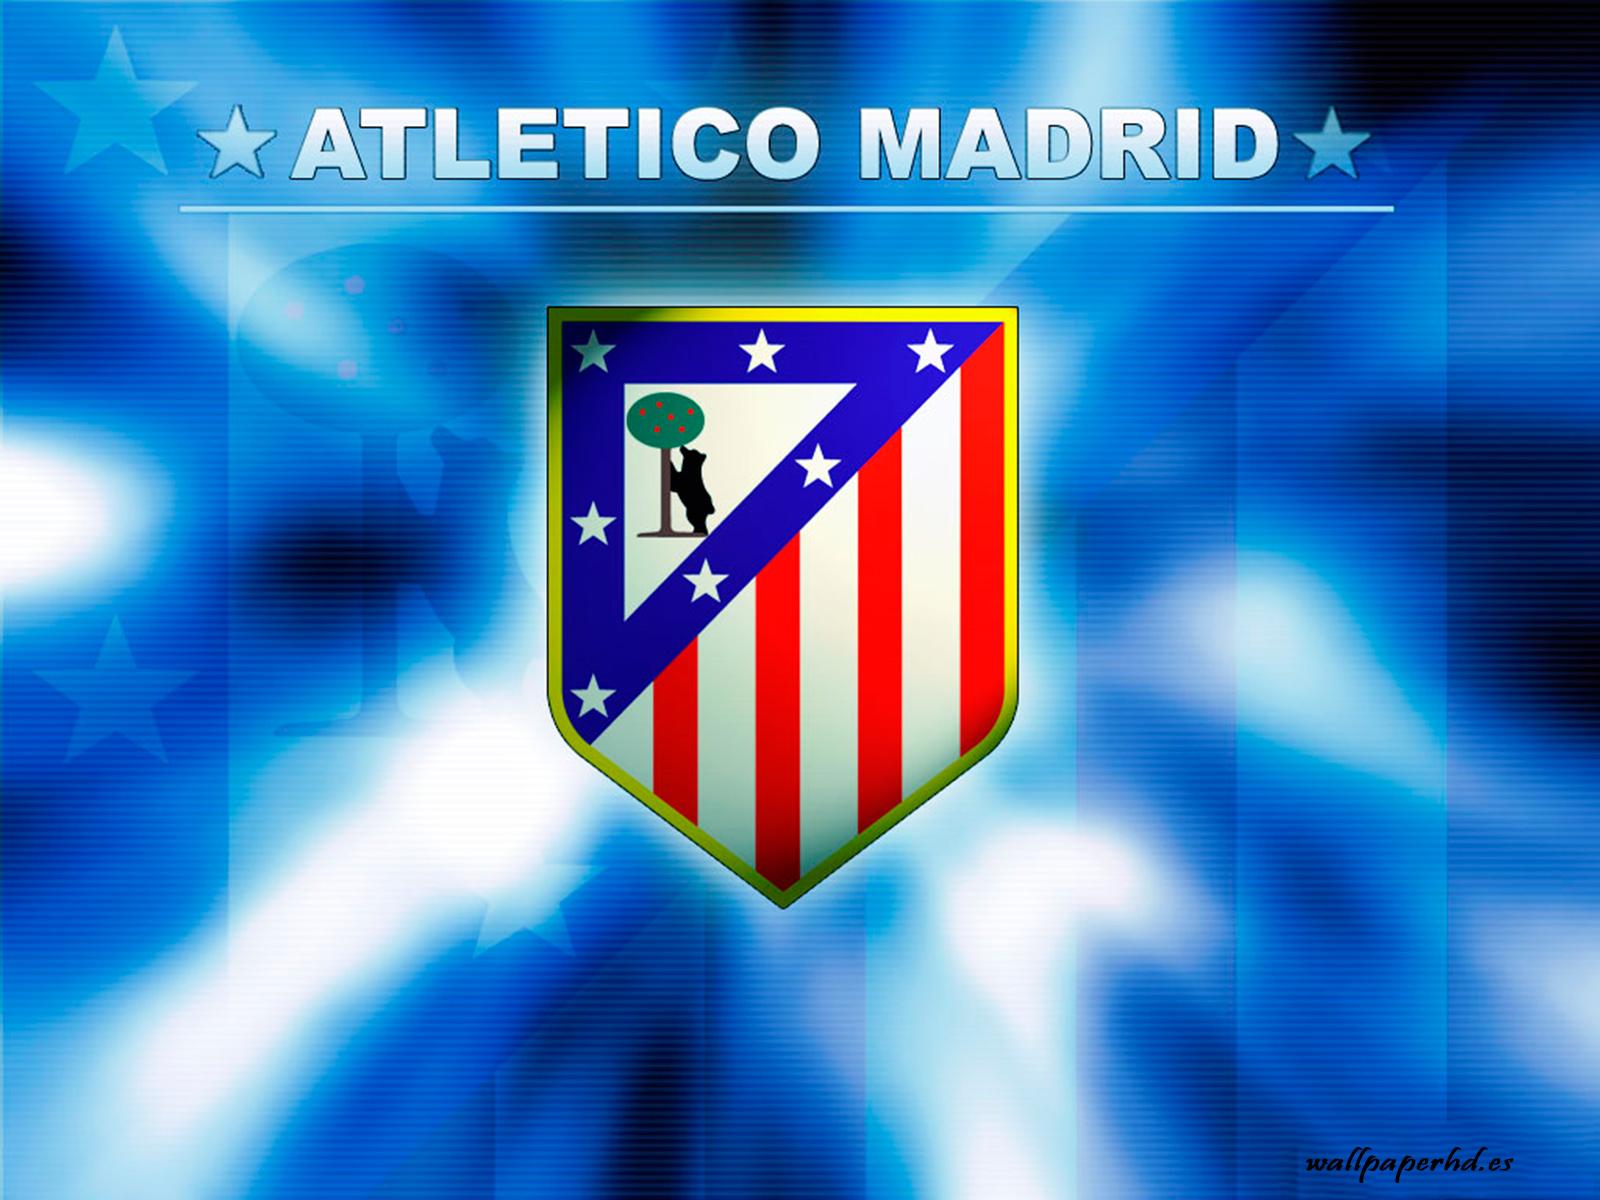 escudo atletico de madrid Wallpaper Hd   Fondos de pantalla HD High 1600x1200